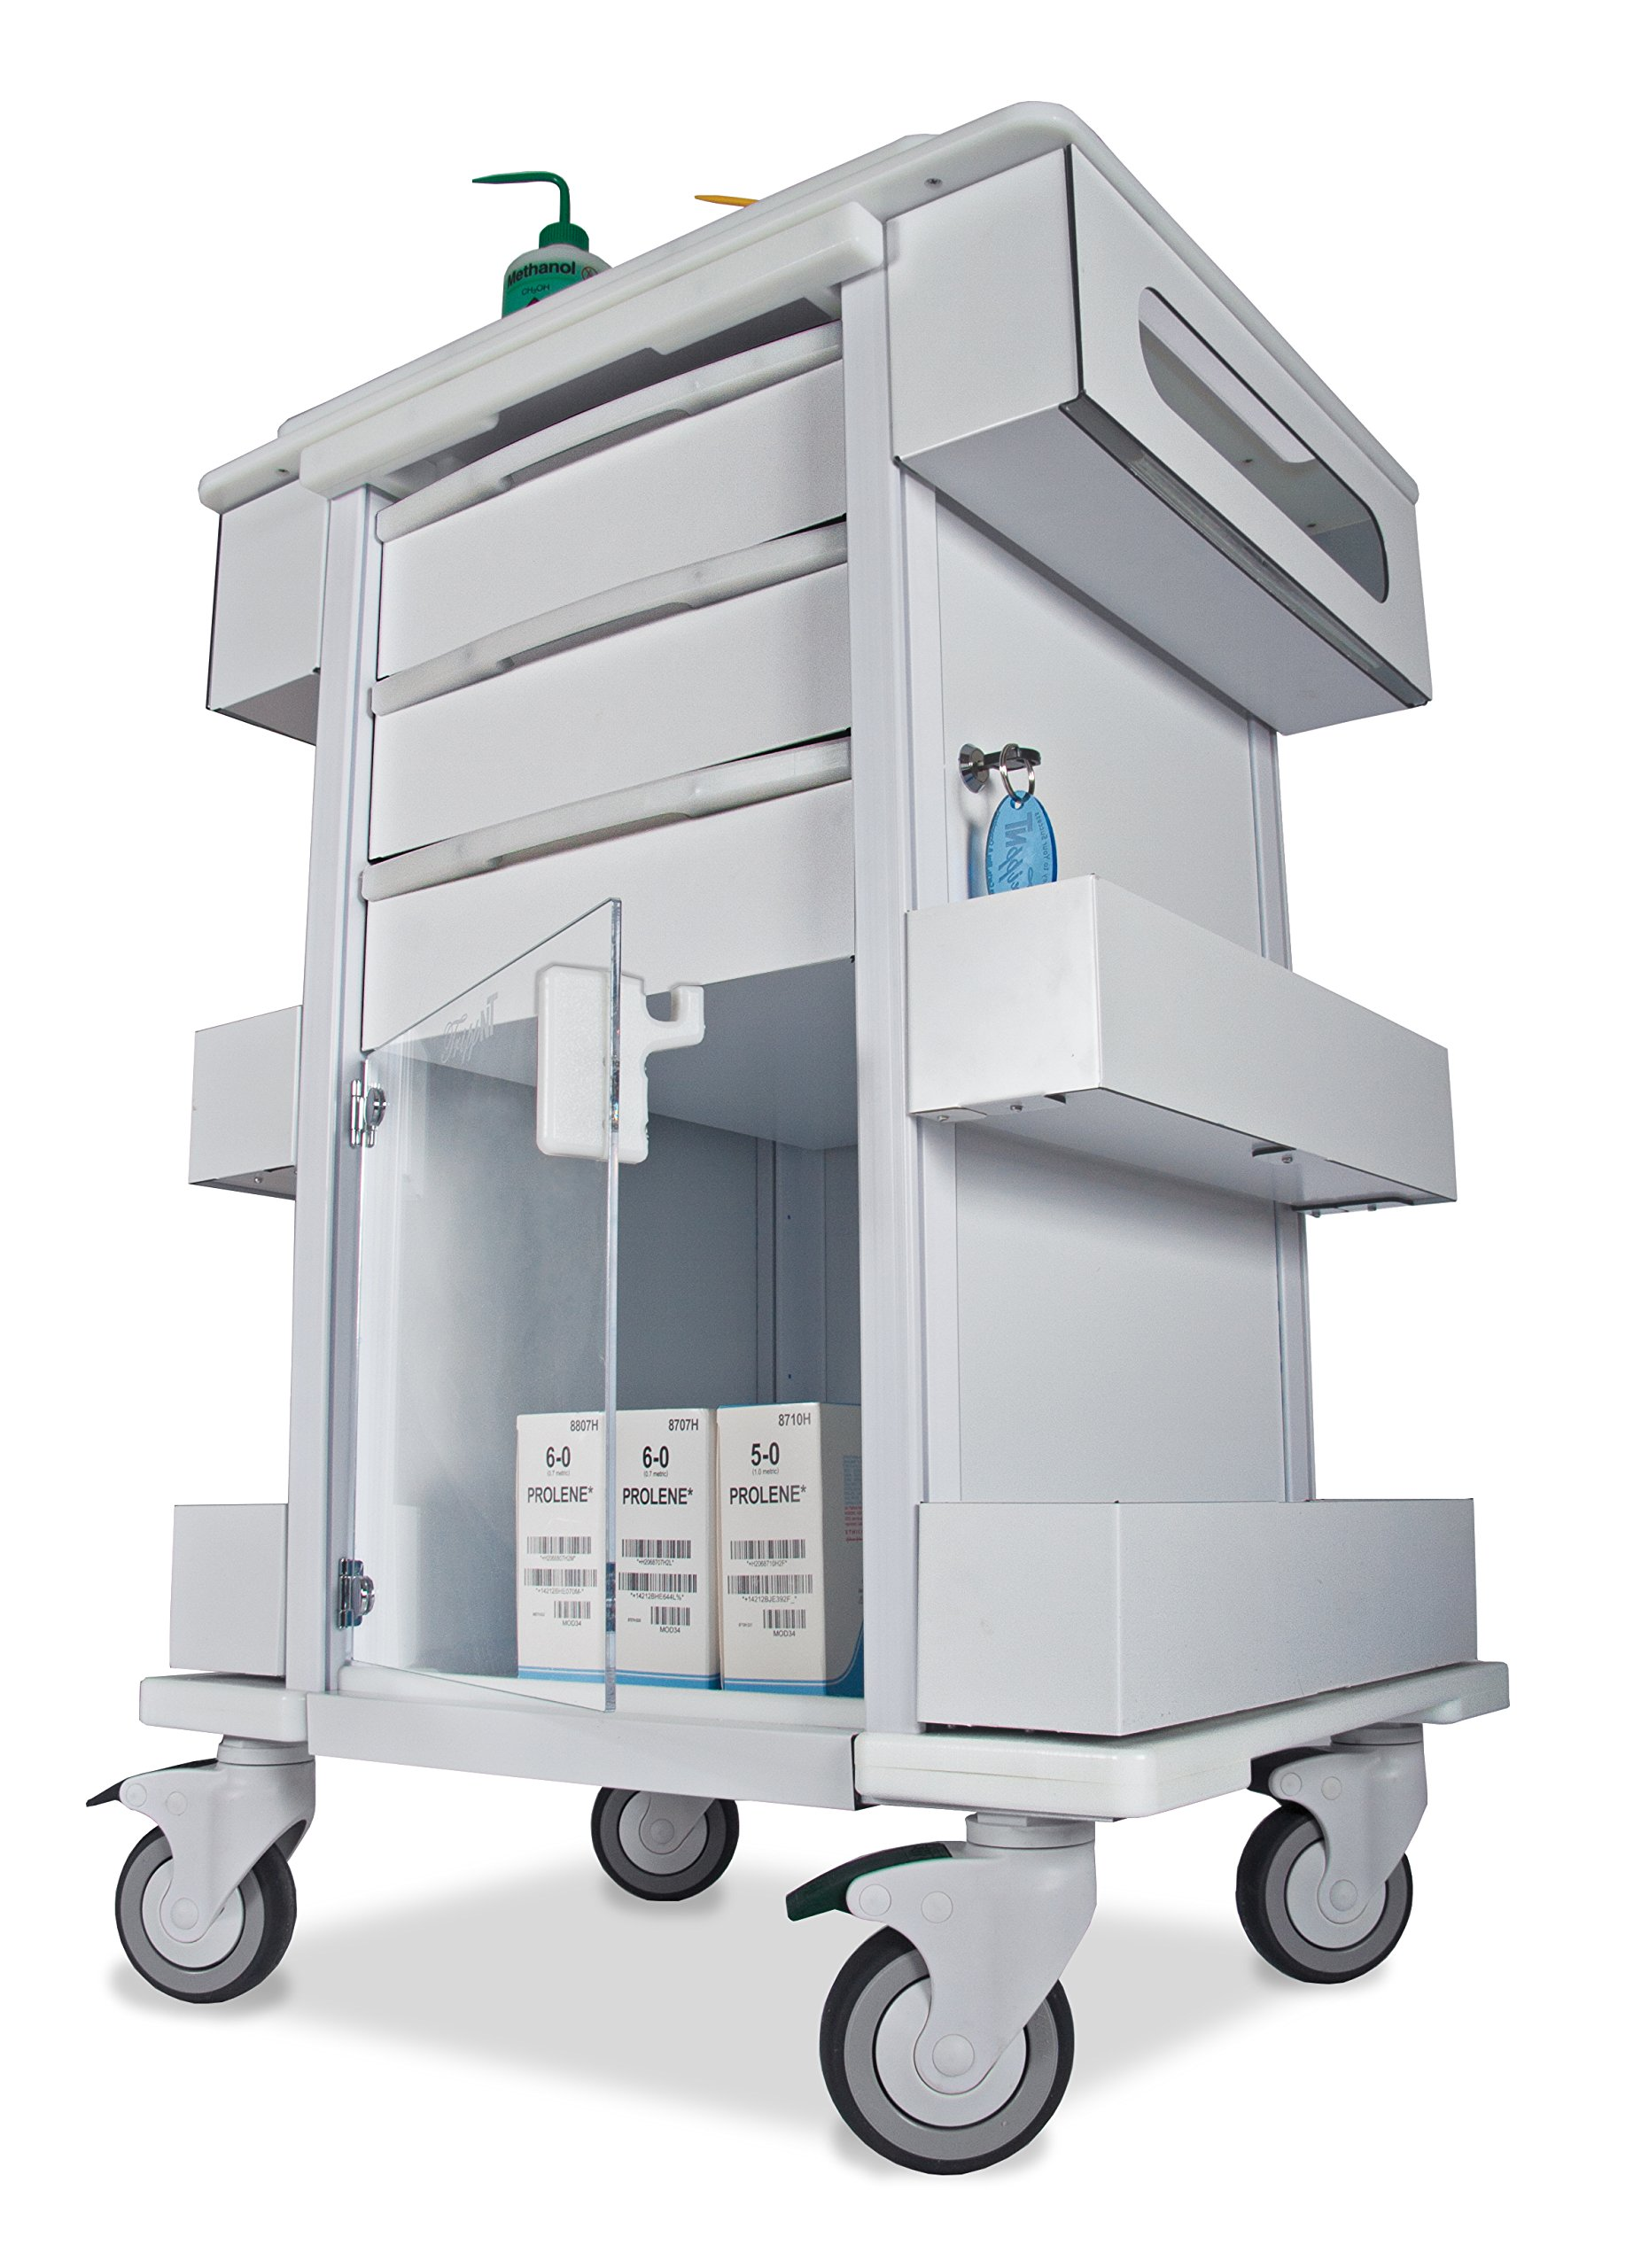 TrippNT 51463 Polyethylene/Aluminum Element 01 All Purpose Healthcare Cart, 24'' W x 35'' H x 19'' D, White by TrippNT (Image #1)